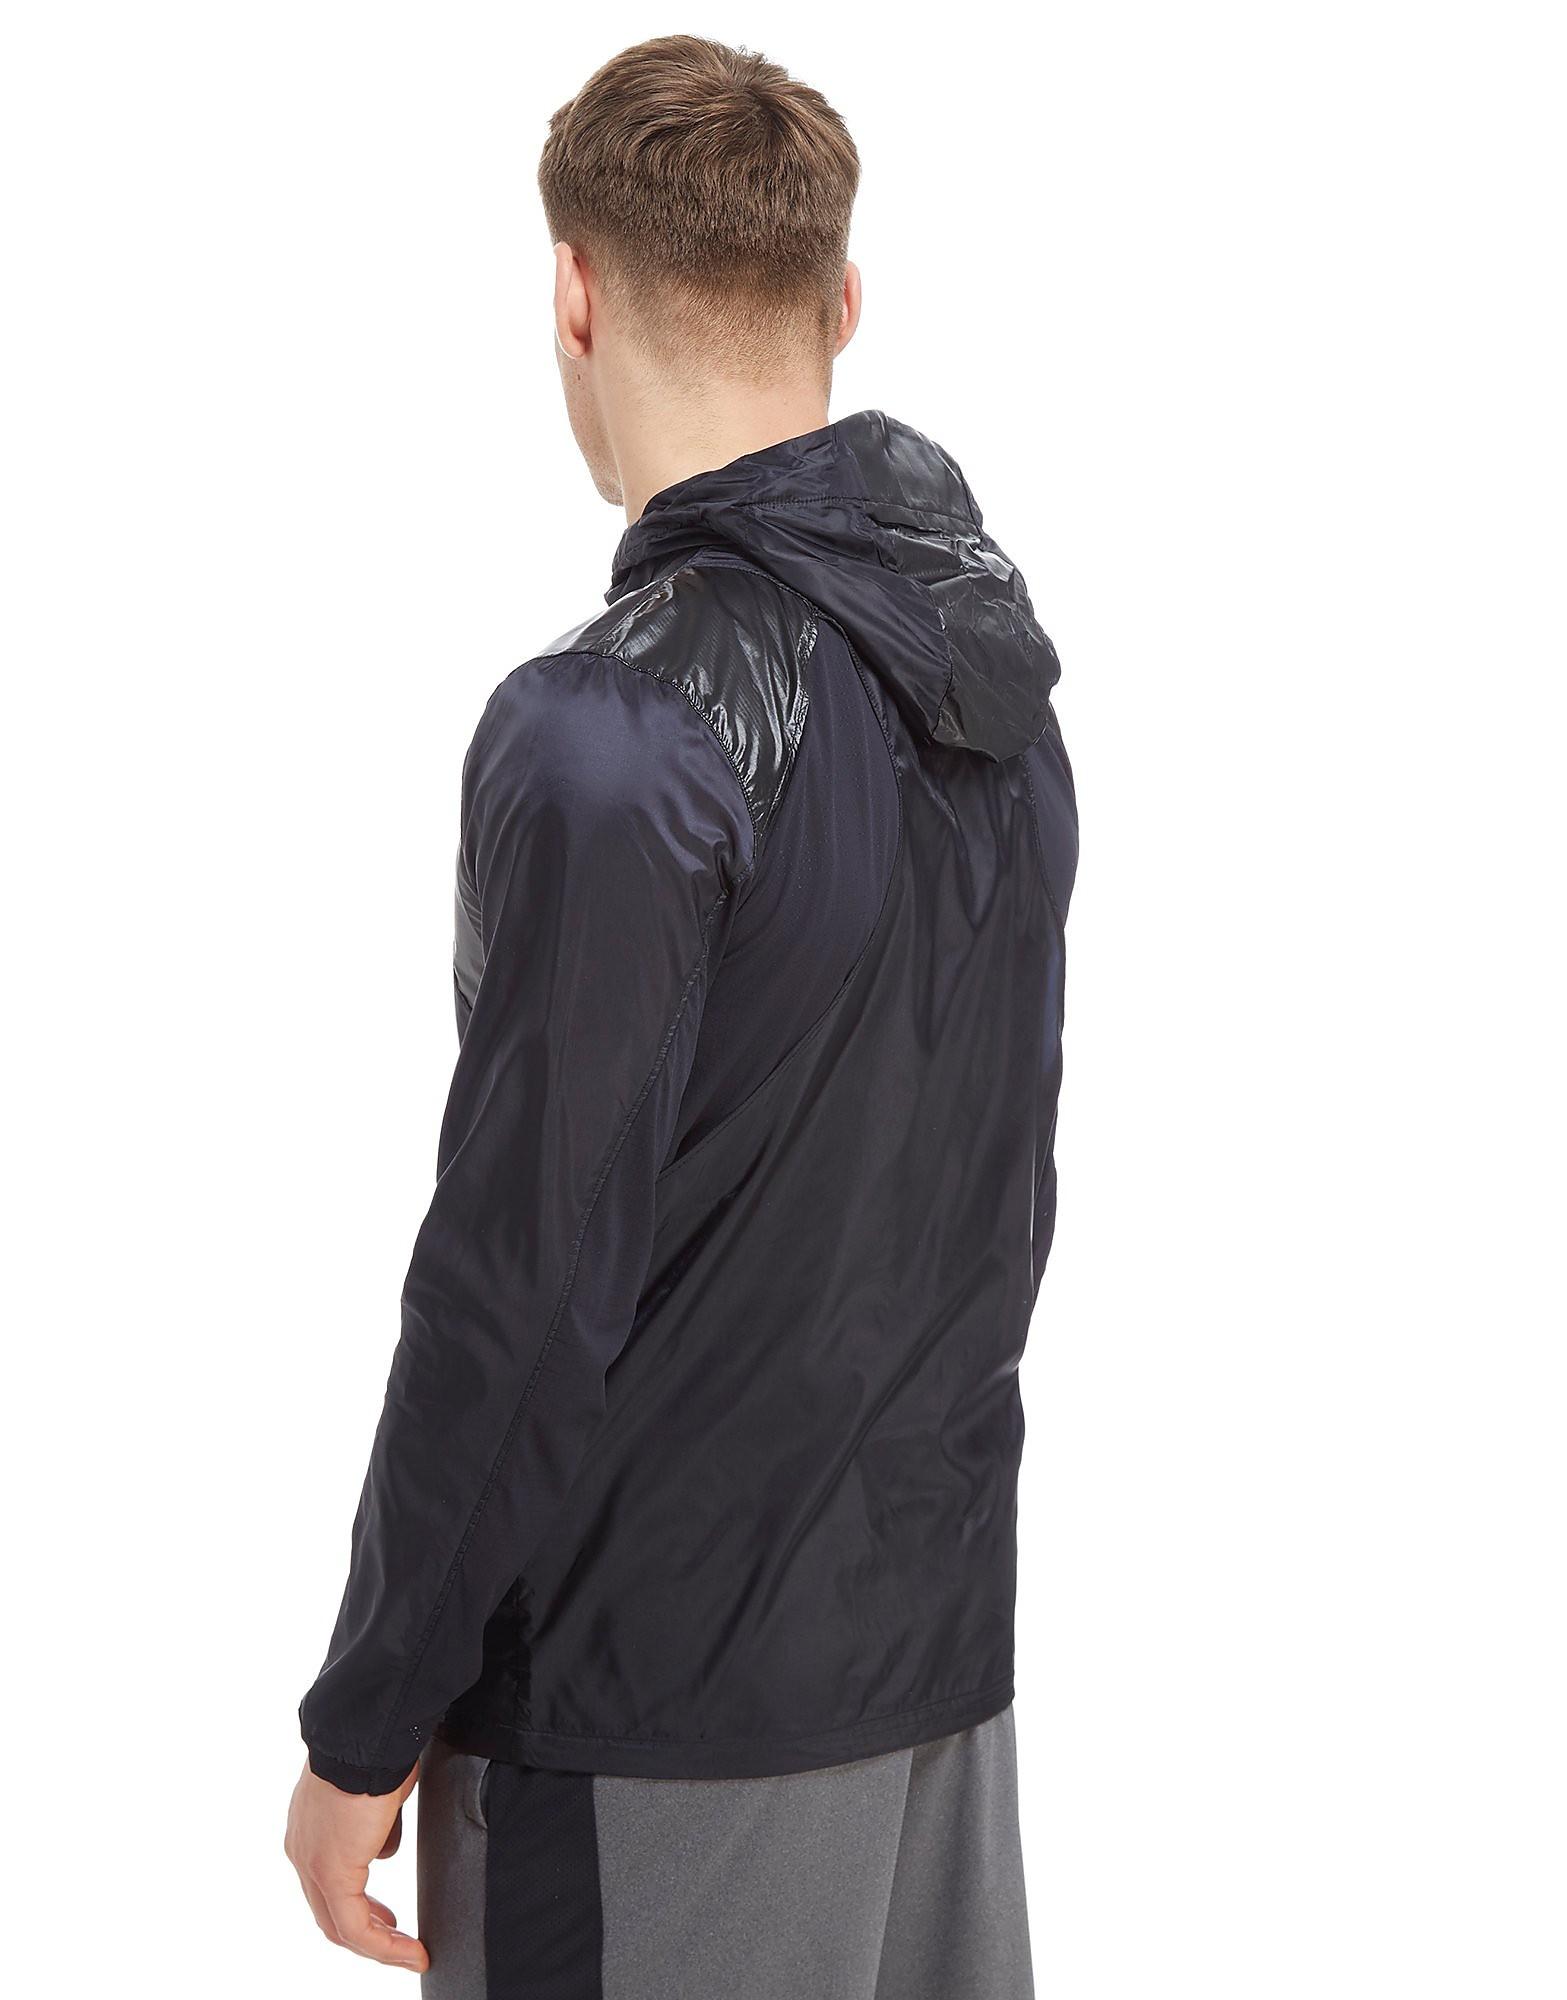 Under Armour Perpetual Full Zip Men's Training Jacket